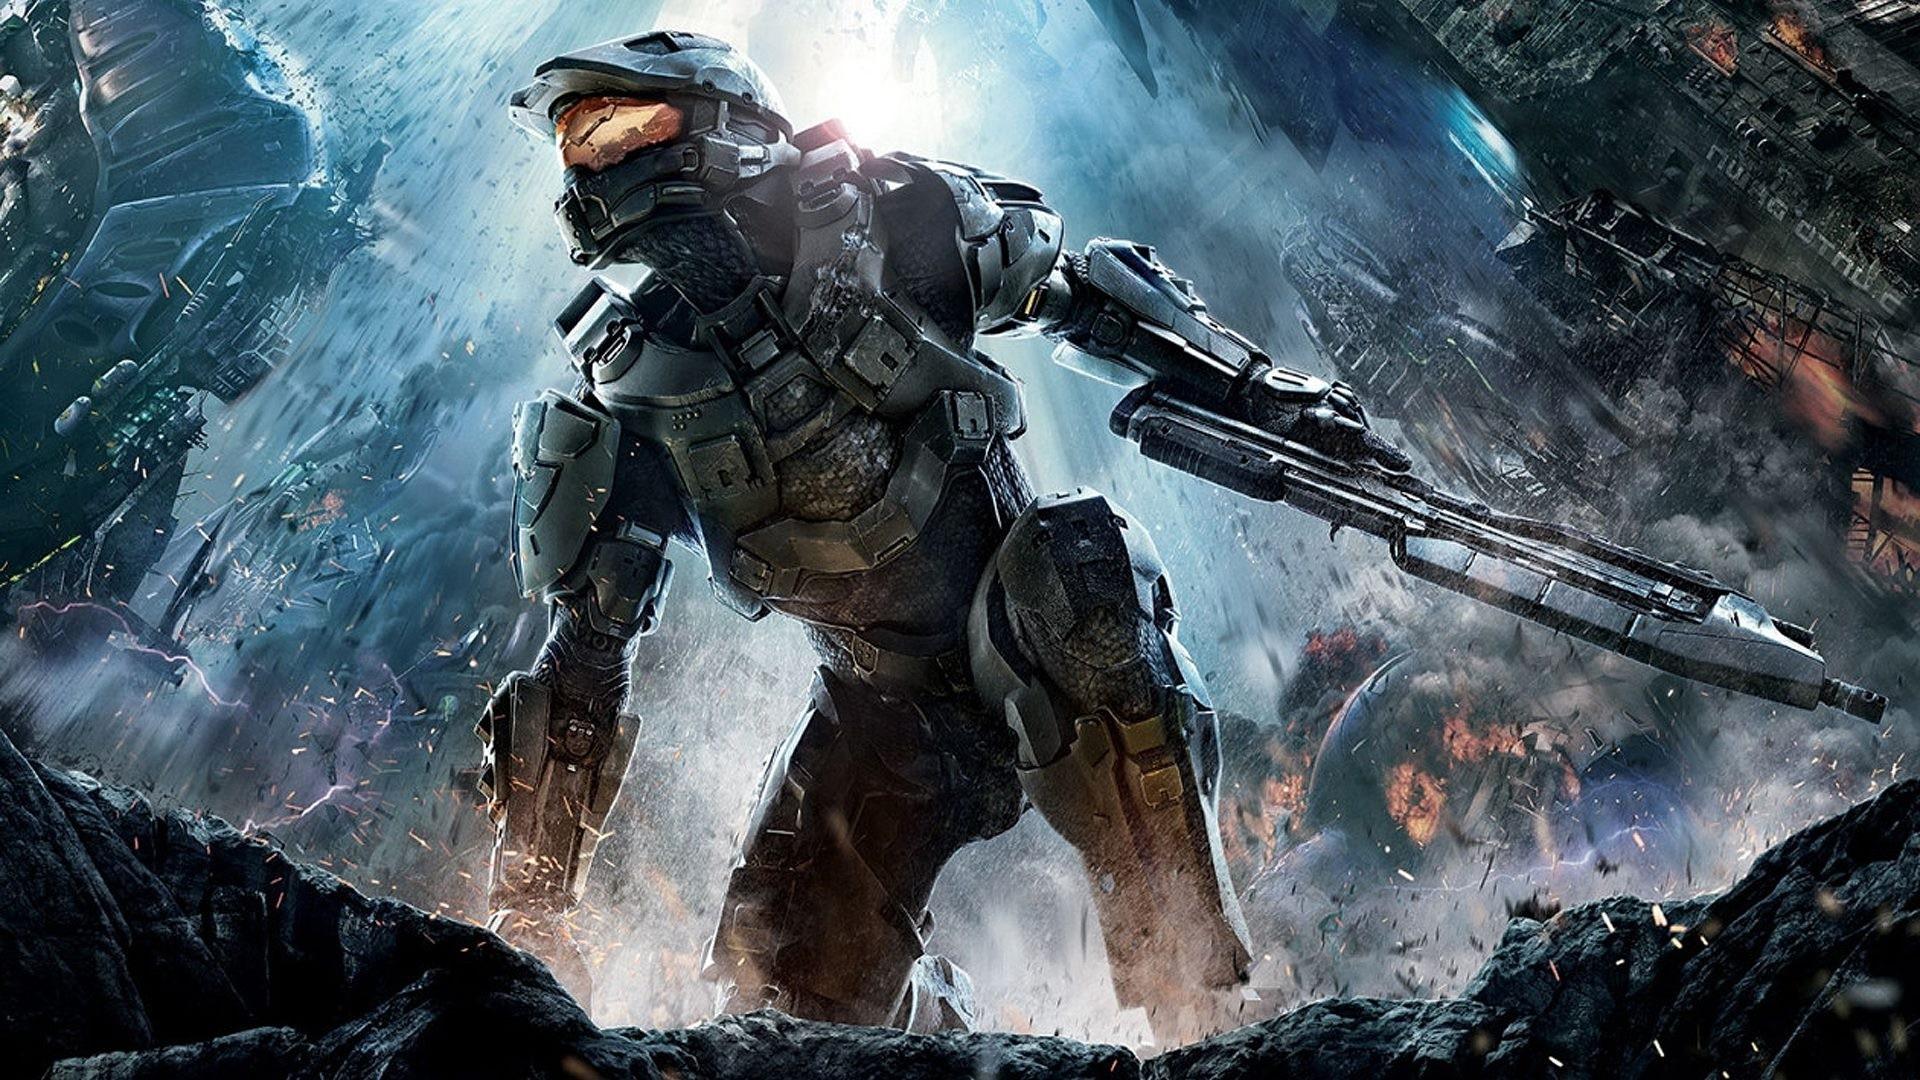 HD Halo Wallpaper 1